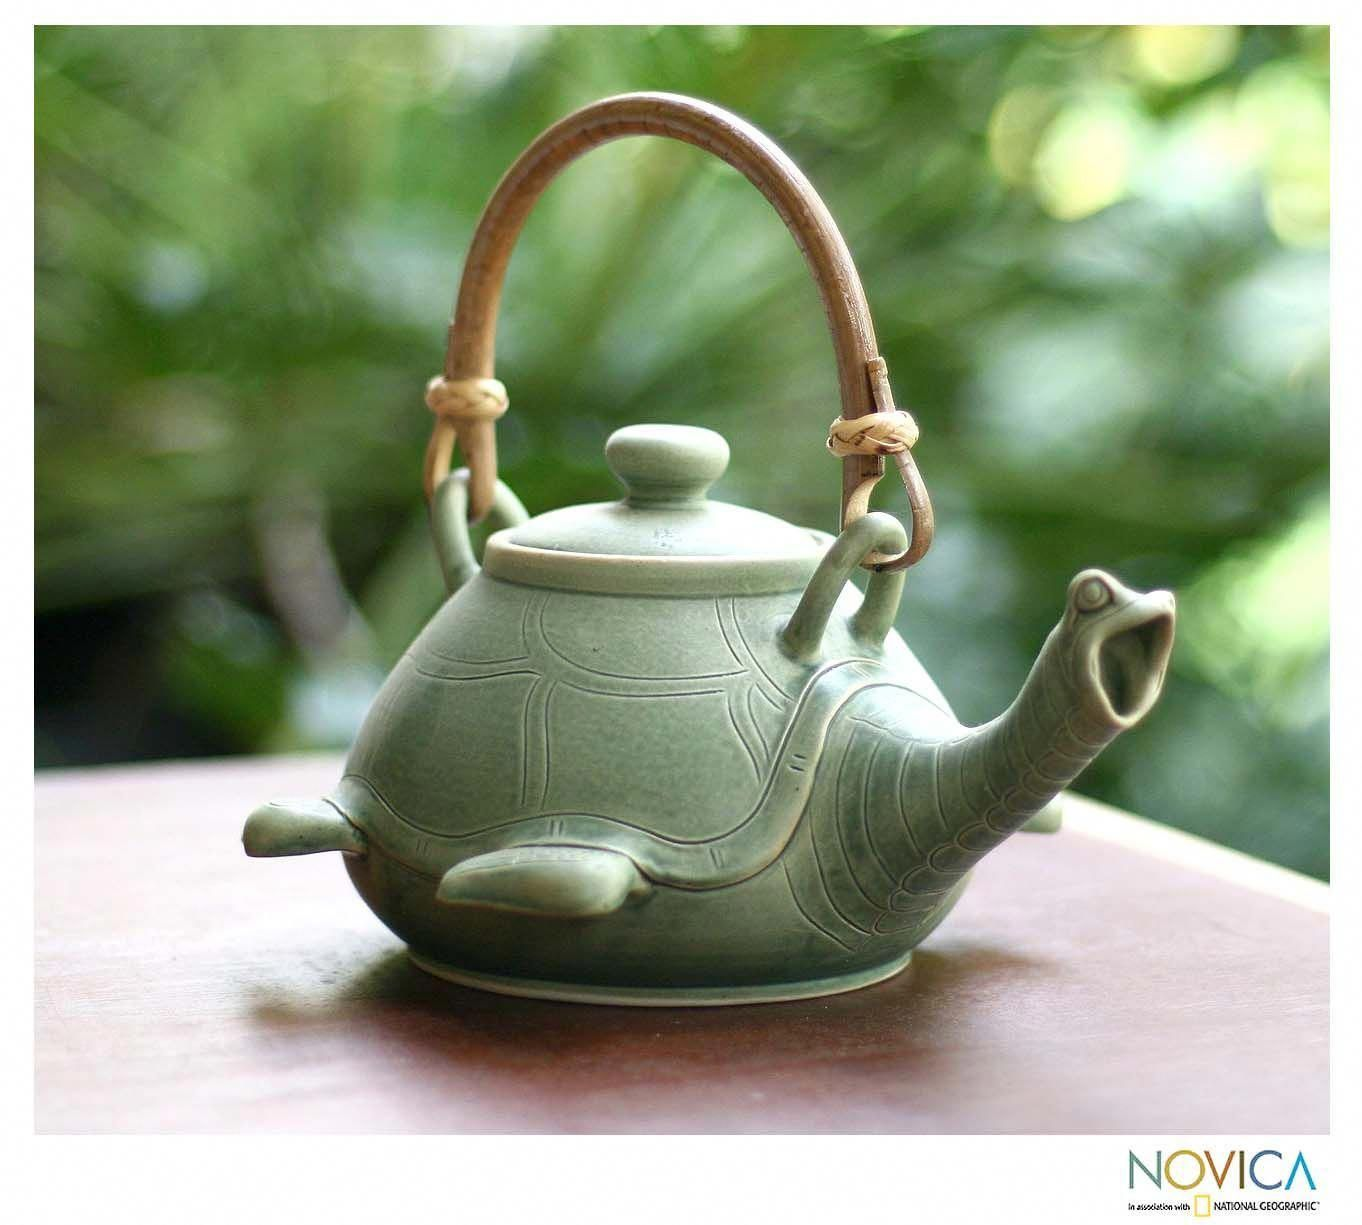 Novica Handmade Ceramic 'Lingering Turtle' Teapot